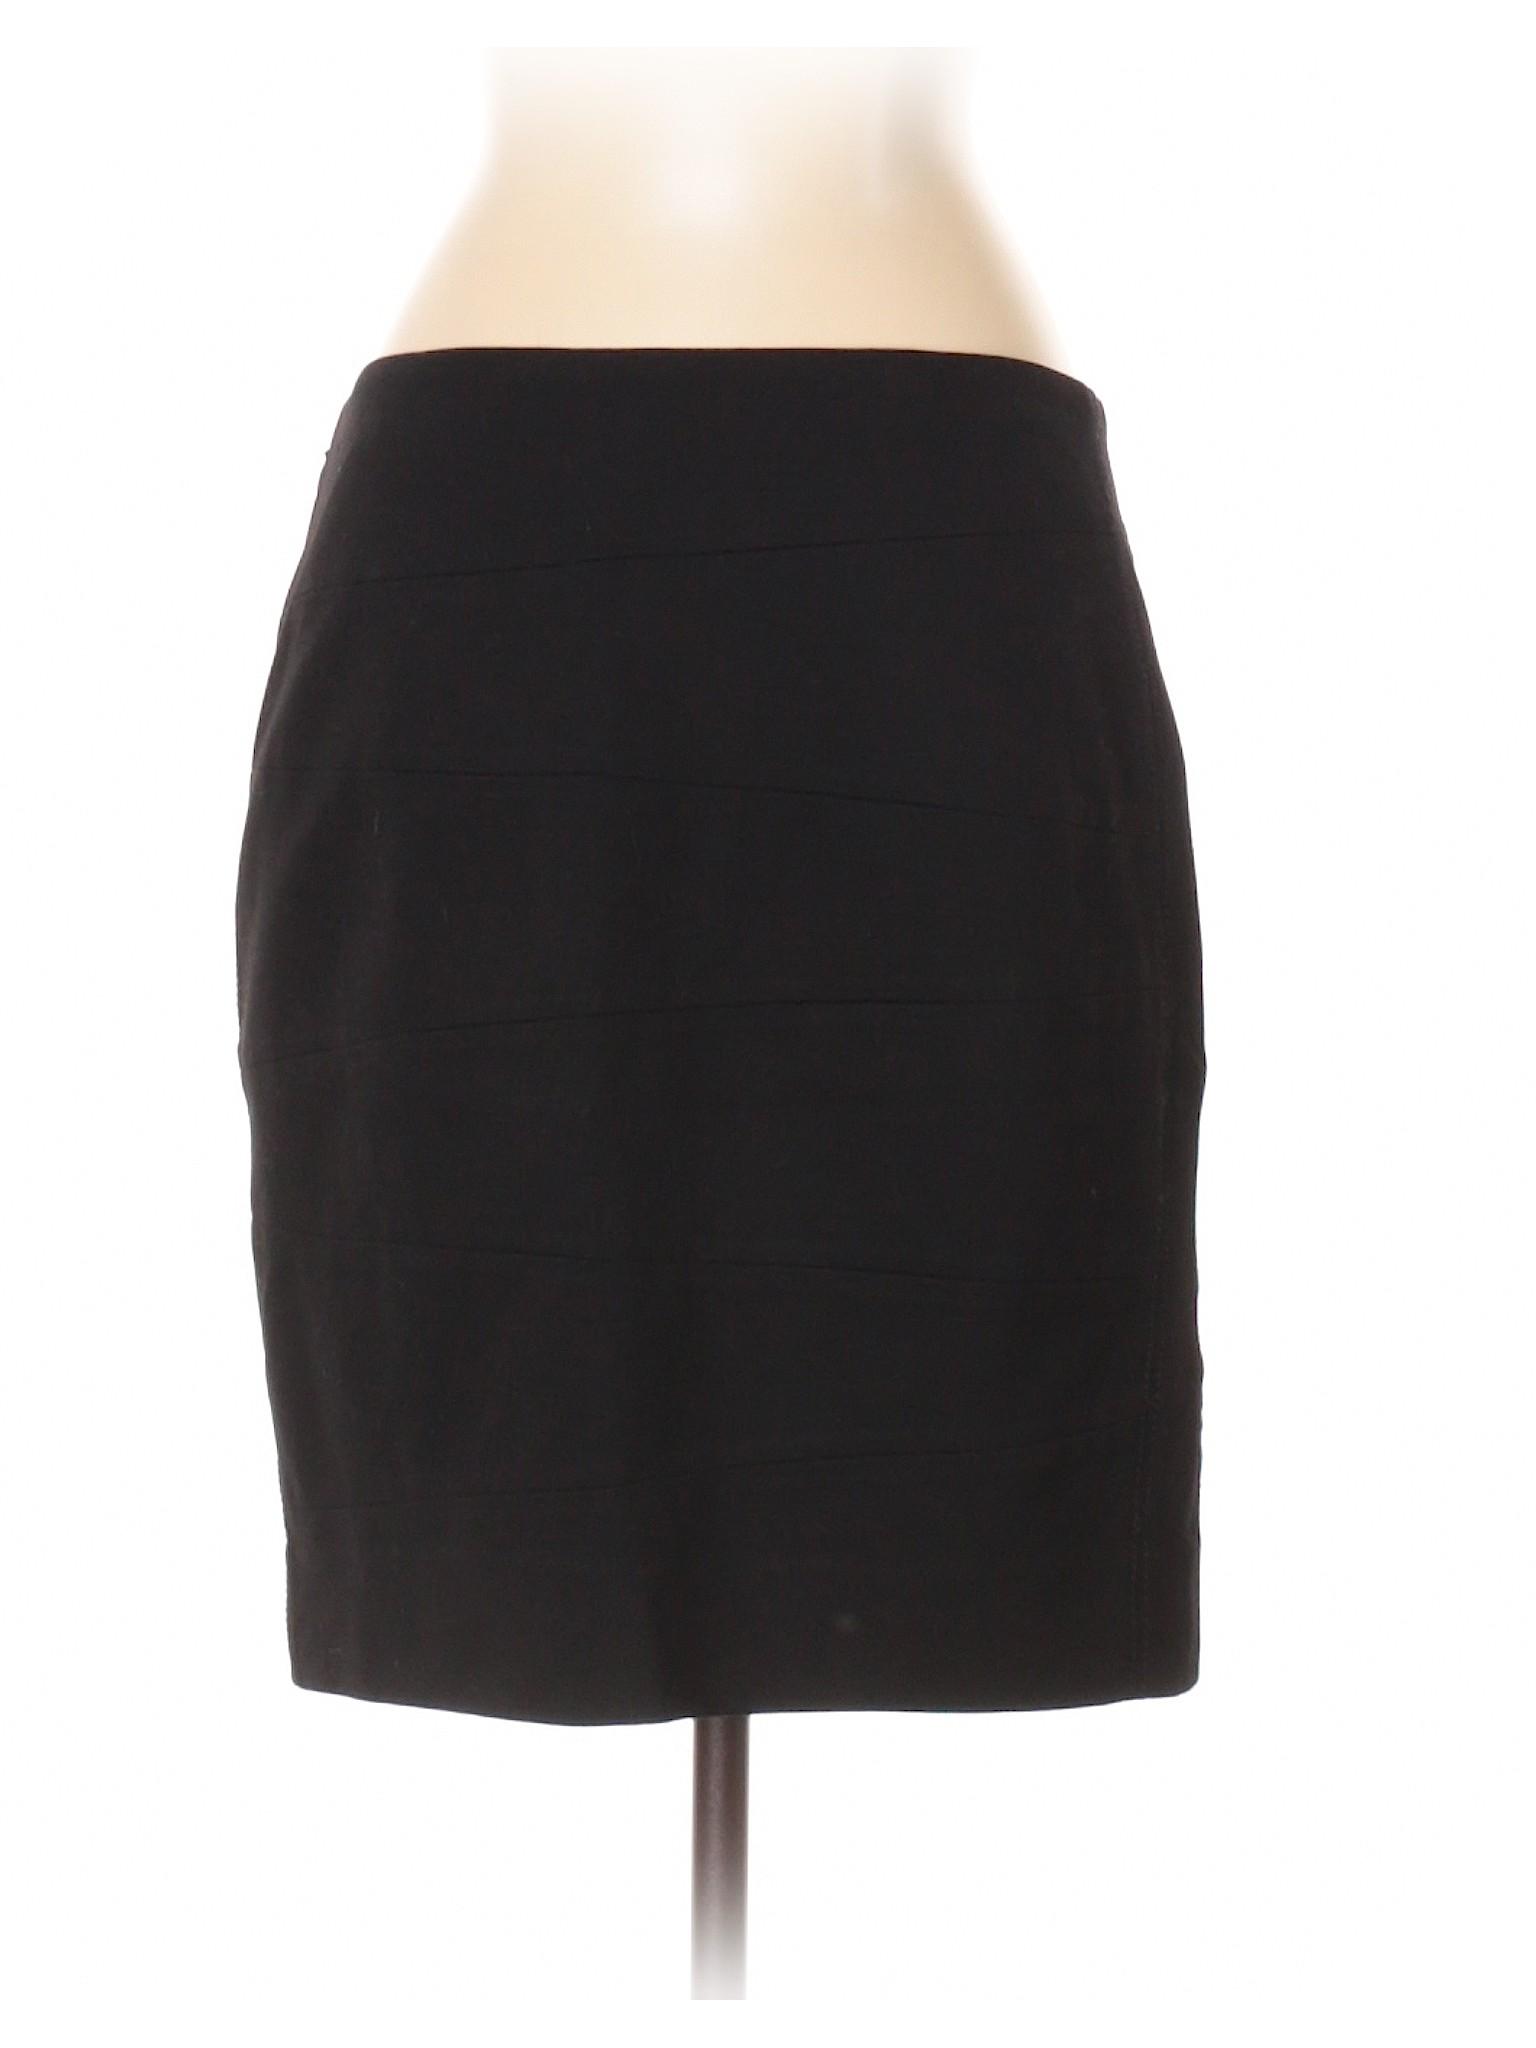 Boutique Casual Boutique Casual Boutique Skirt Boutique Skirt Skirt Casual Casual dEXU7xw